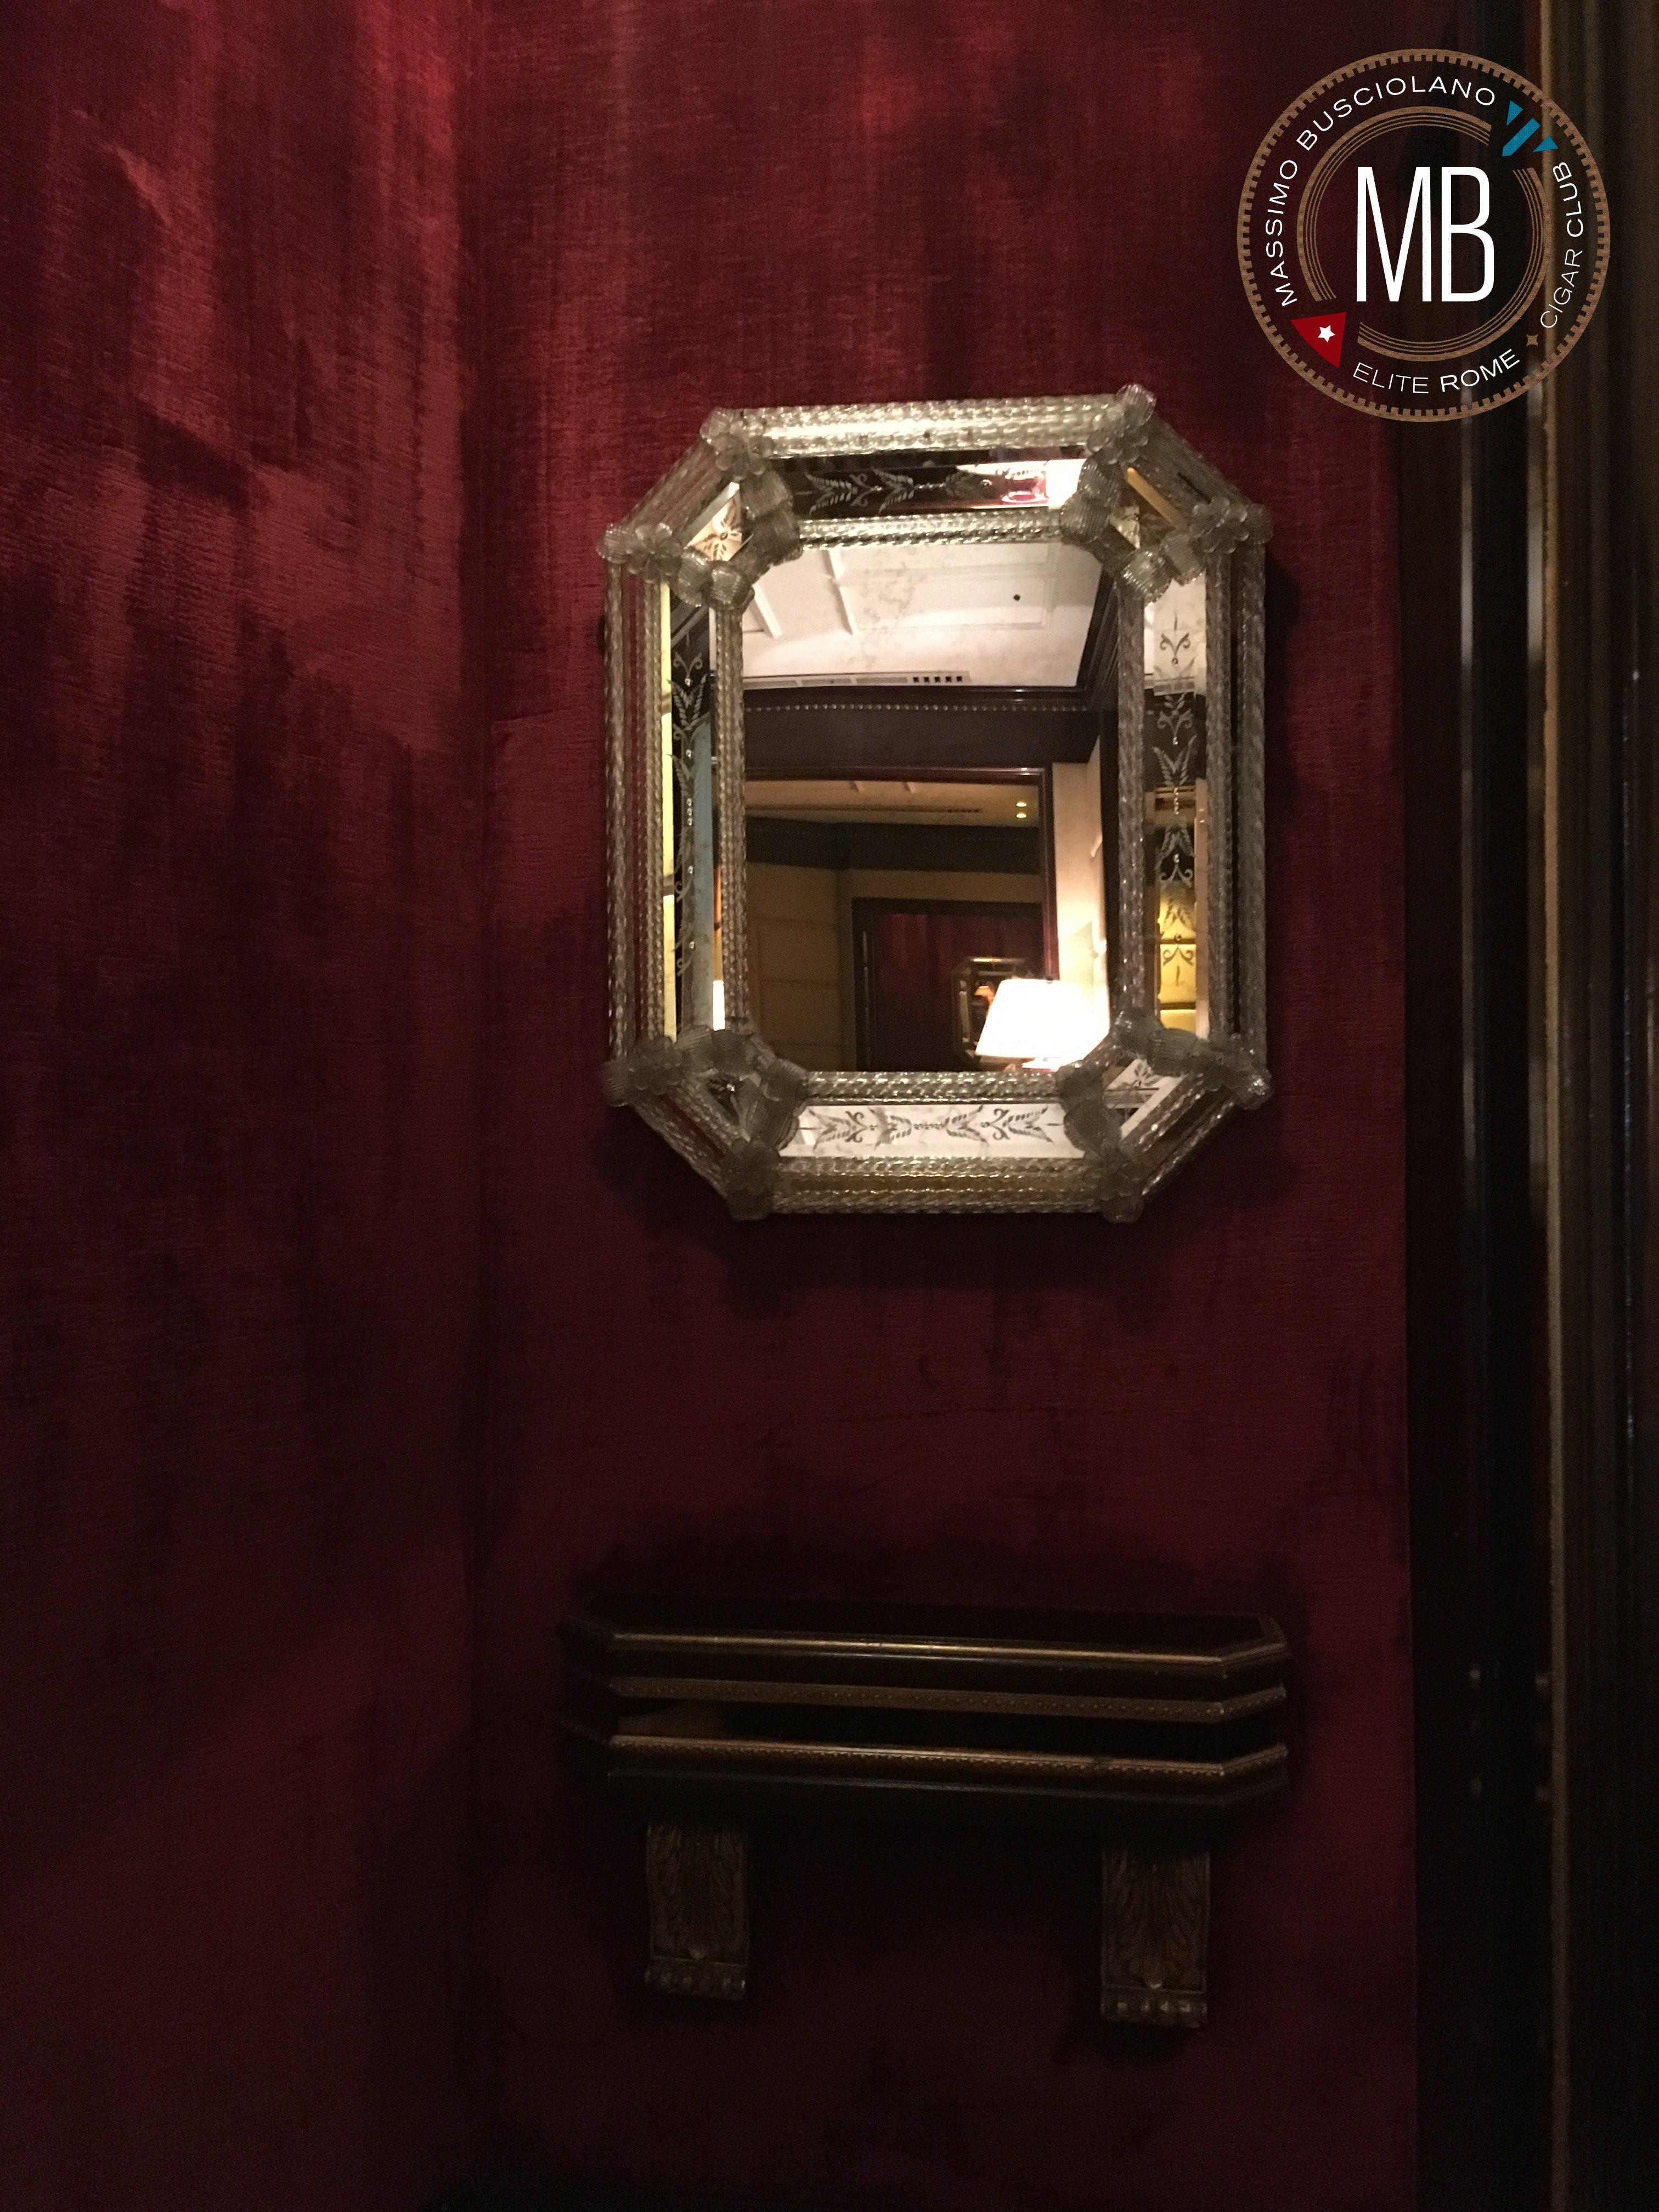 """MB Elite Rome Cigar Club Location"""